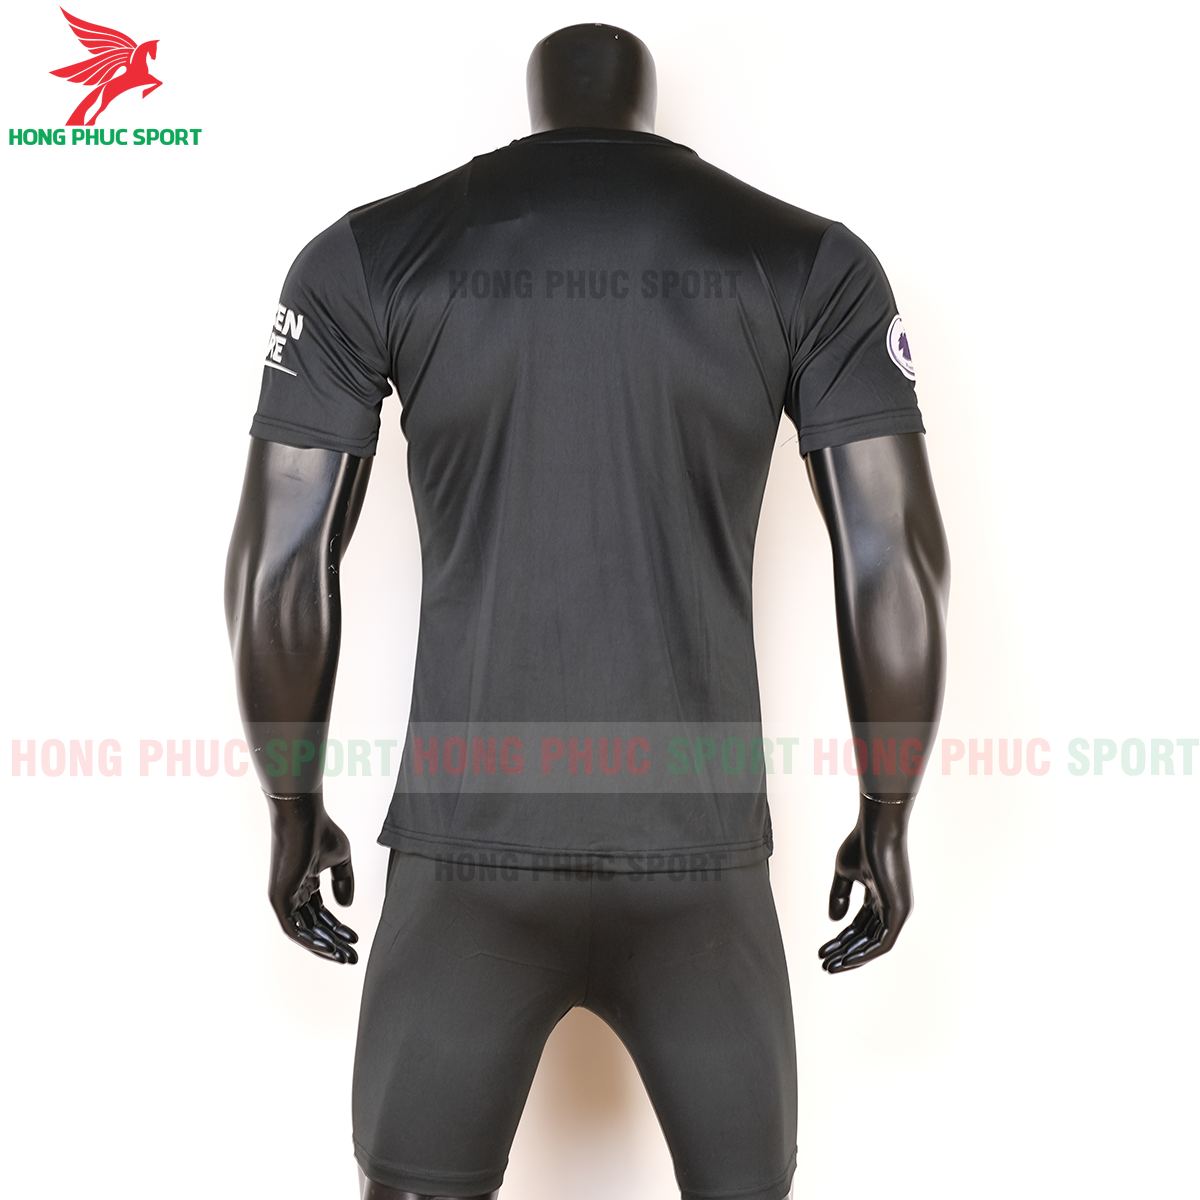 https://cdn.hongphucsport.com/unsafe/s4.shopbay.vn/files/285/ao-bong-da-chelsea-2020-2021-phien-ban-fan-sau-5f6c4a9dbb709.png